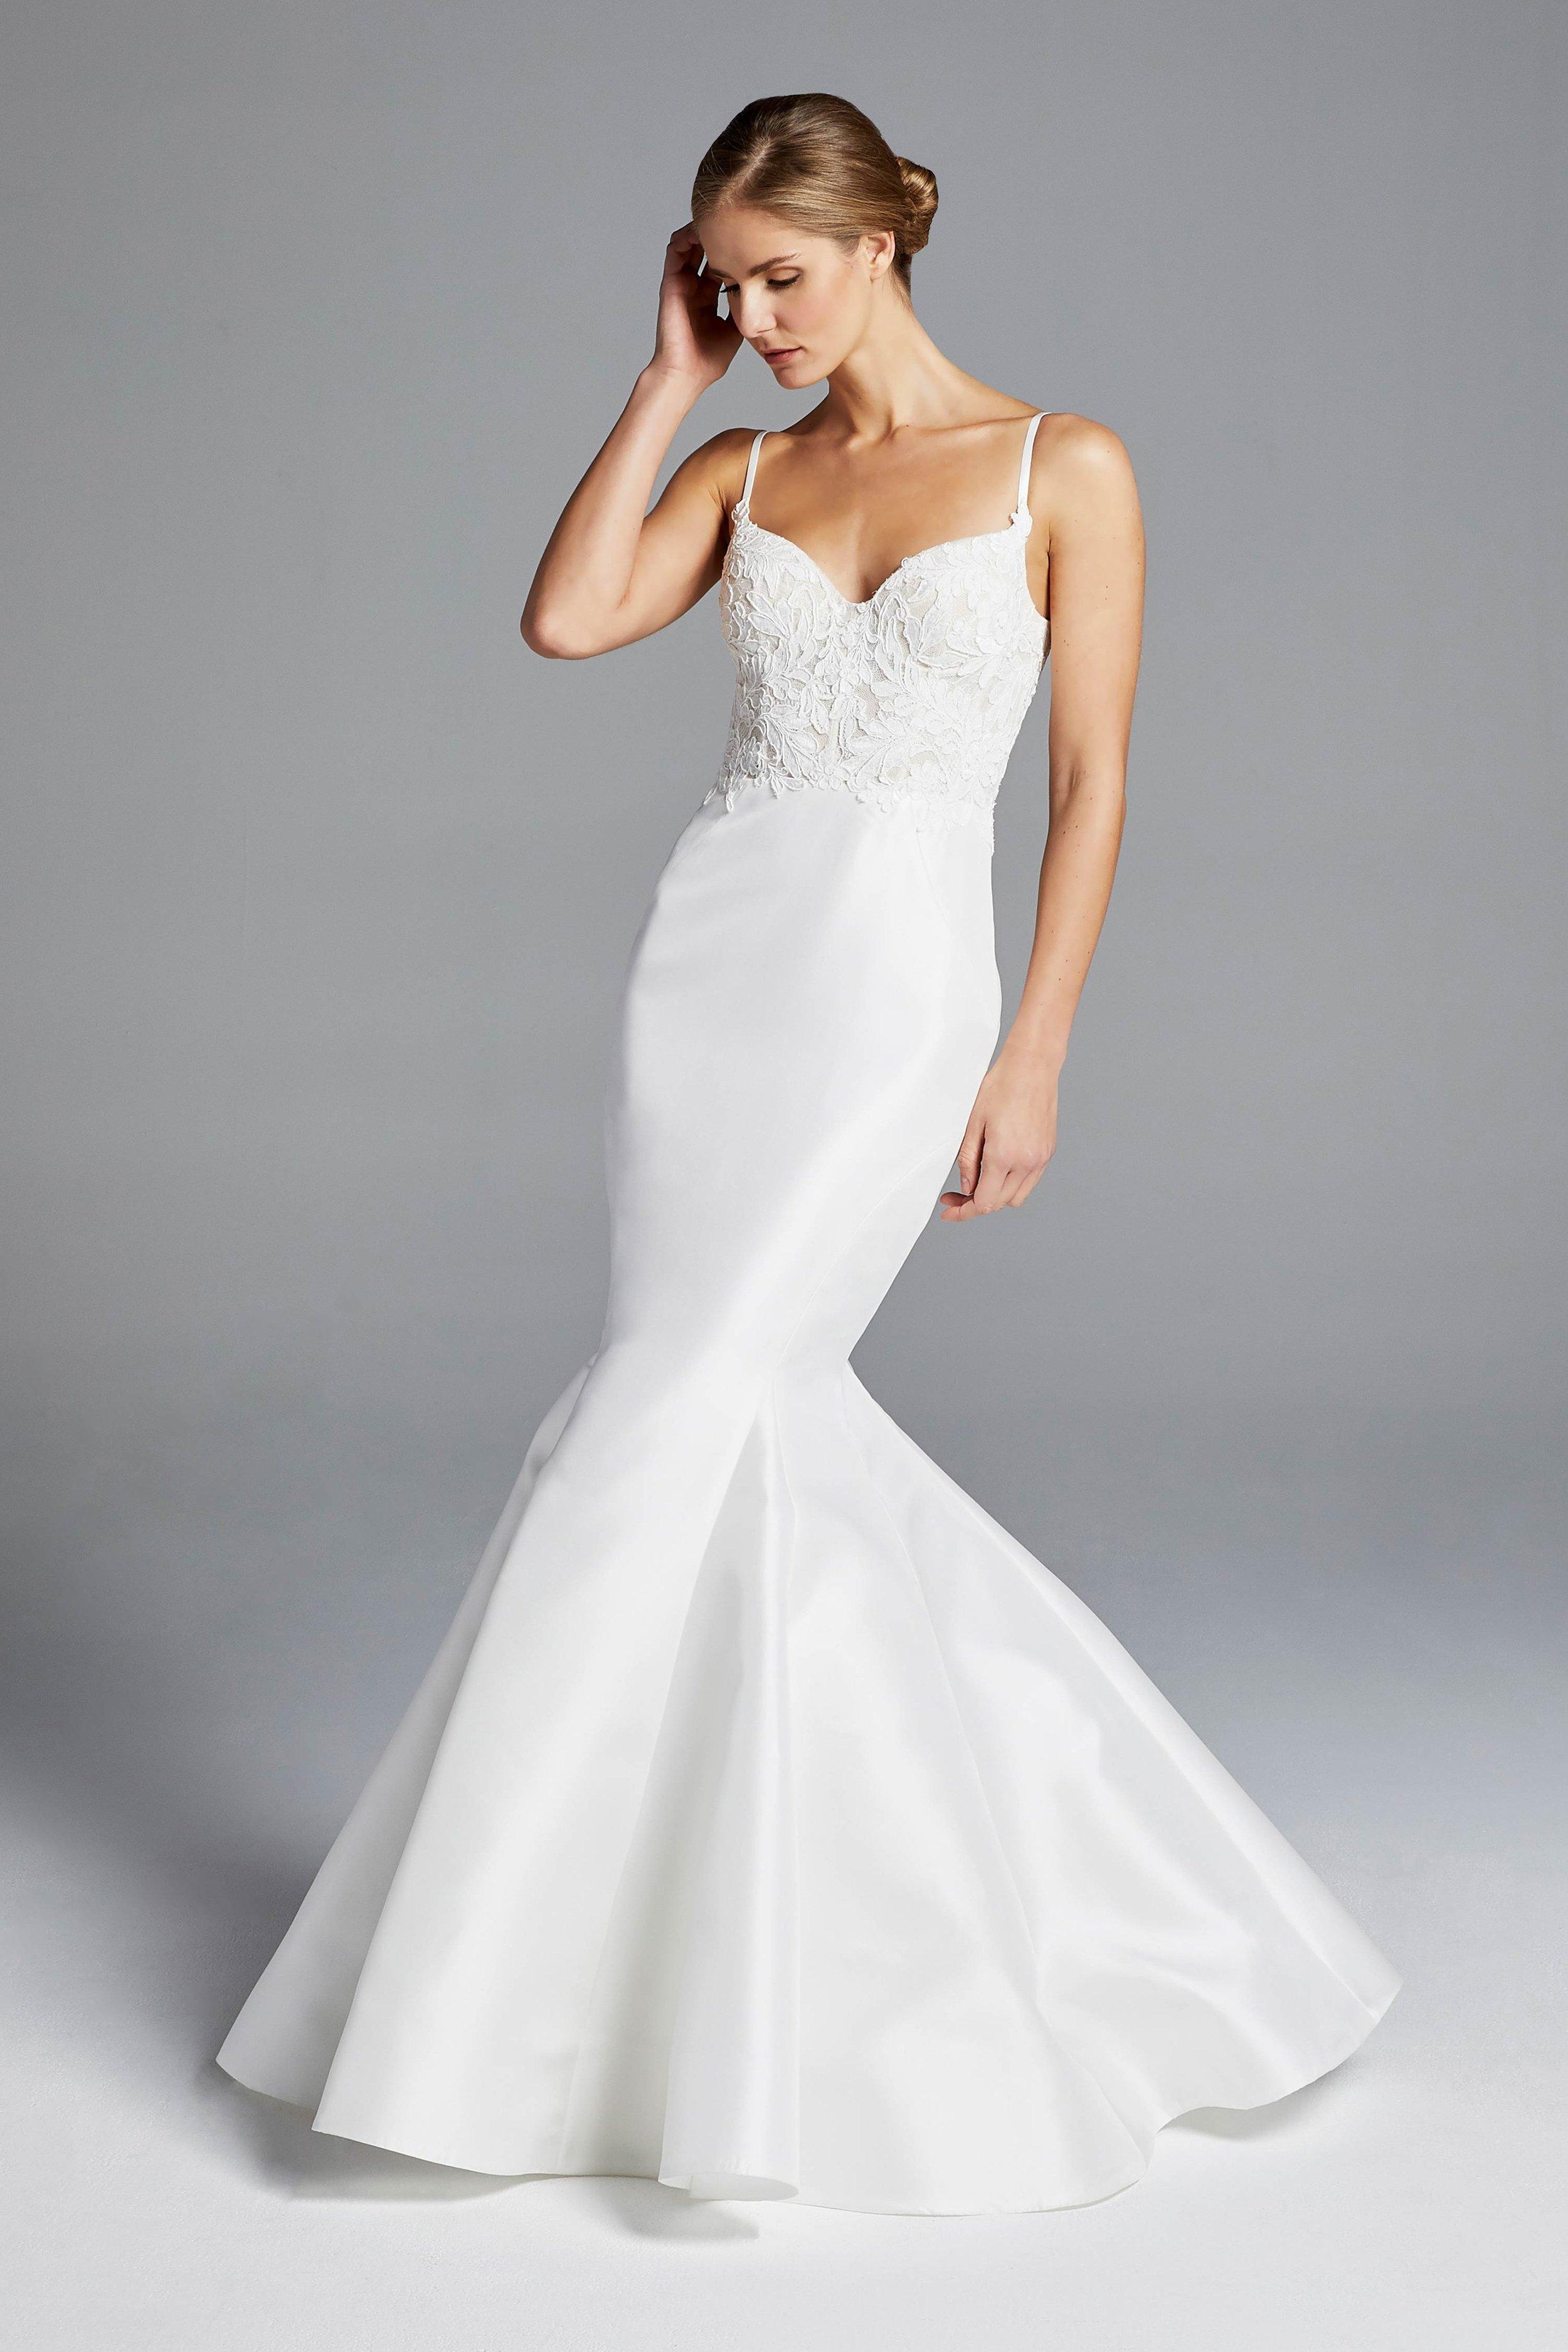 AB_IMAN_FRONT_VOGUE-spring-2019-bridal.jpg